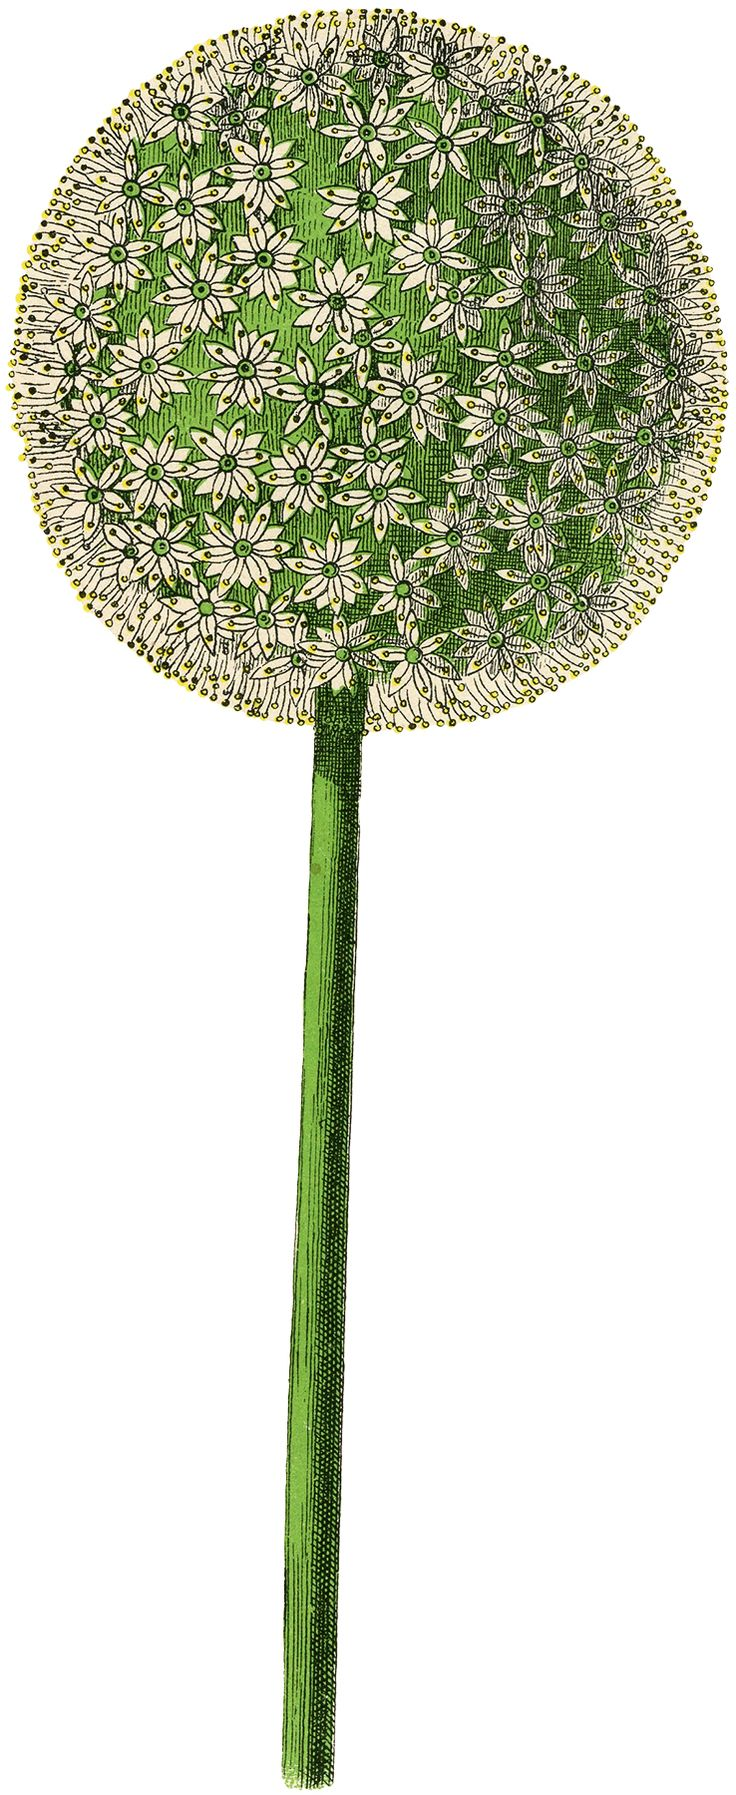 Charming Vintage Allium Flower Image! - The Graphics Fairy